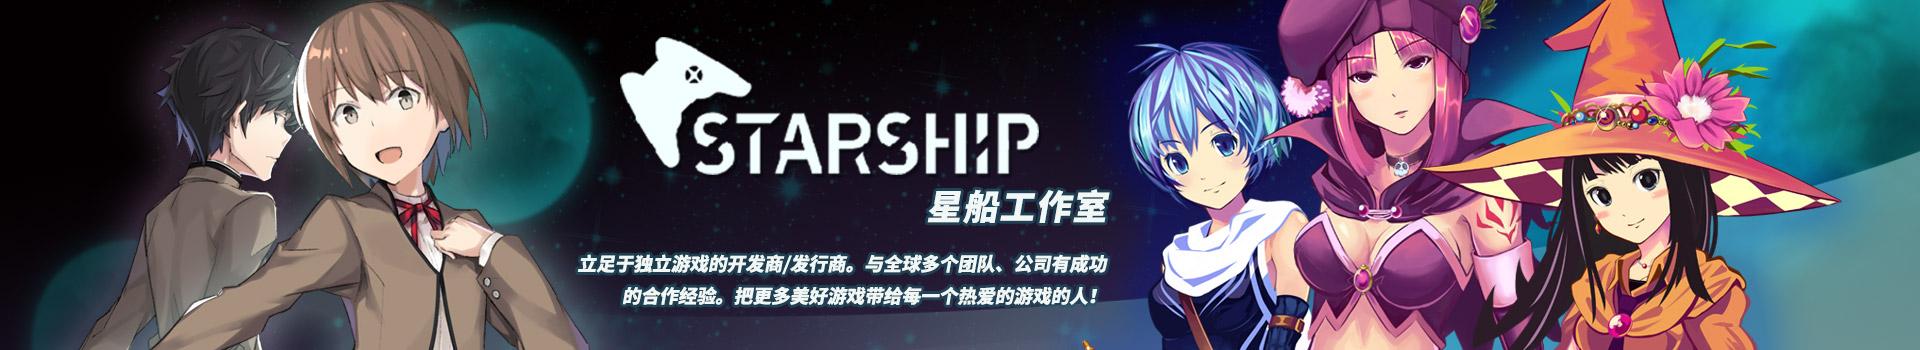 Starship�板���ラ┗ �ㄥ�轰���3��璧�